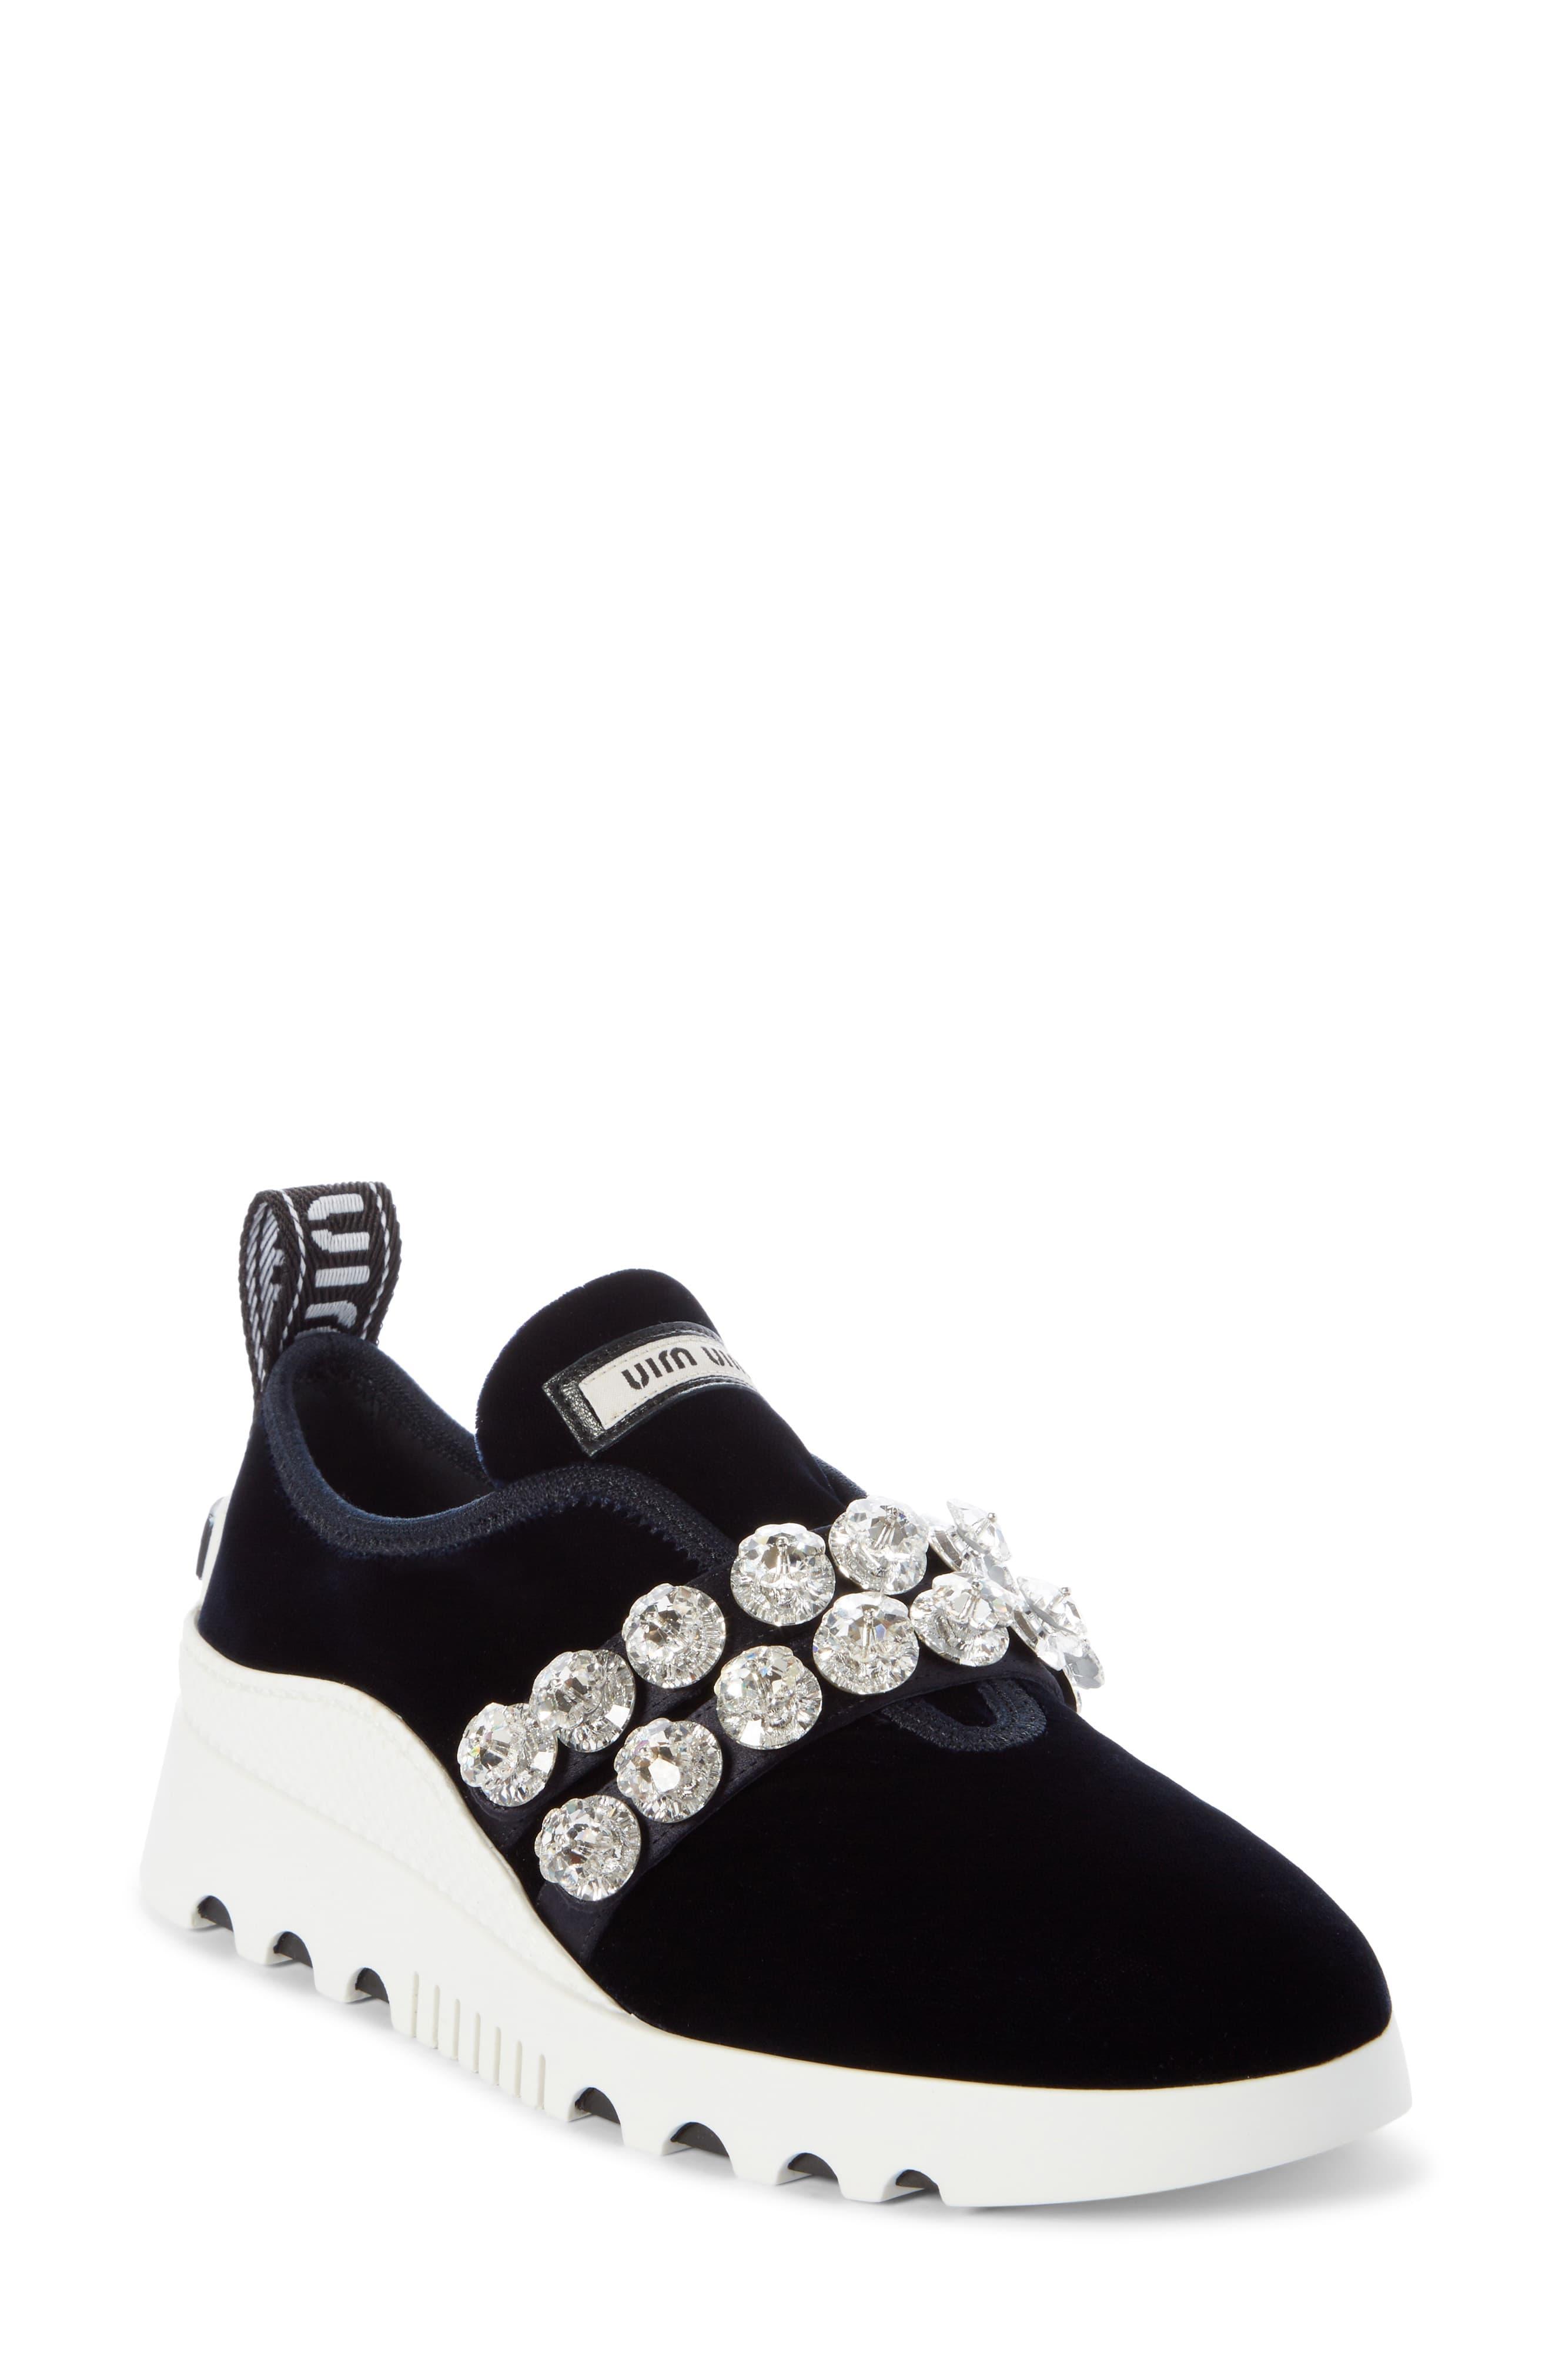 Miu Miu Jewel Strap Slip On Sneaker (Women | Ankle strap